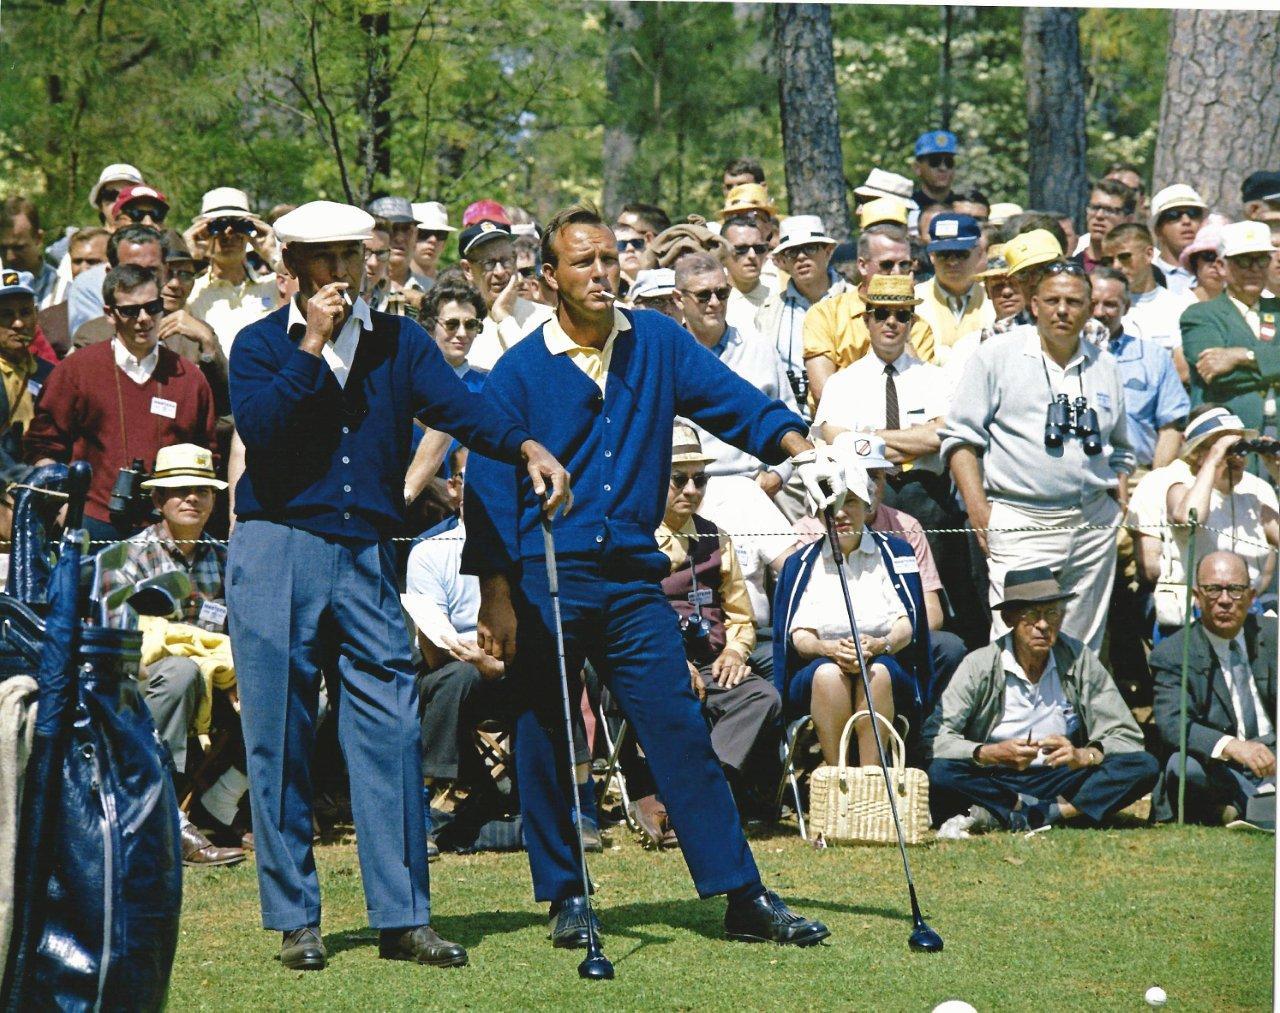 Golf Arnold Palmer And Ben Hogan Smoking Photo Picture